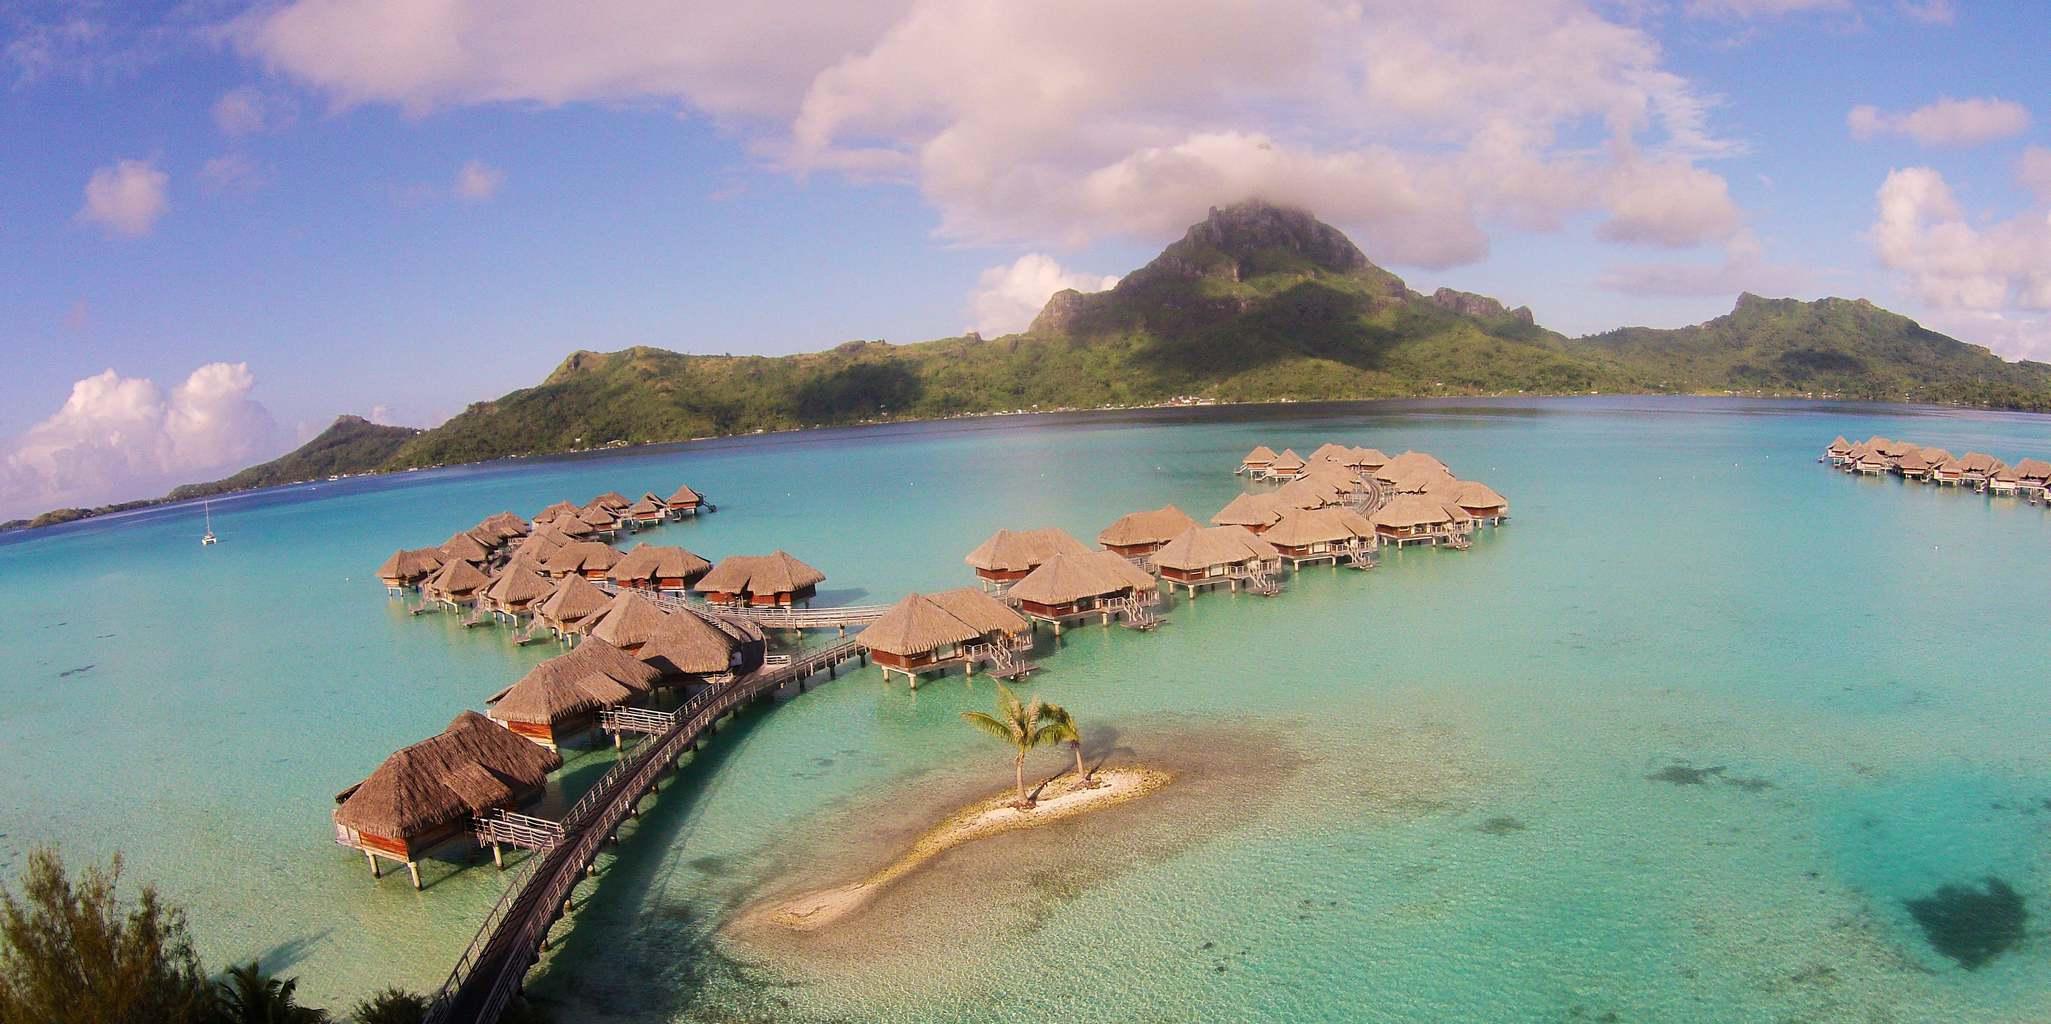 Honeymooning In The Maldives Or In Bora Bora